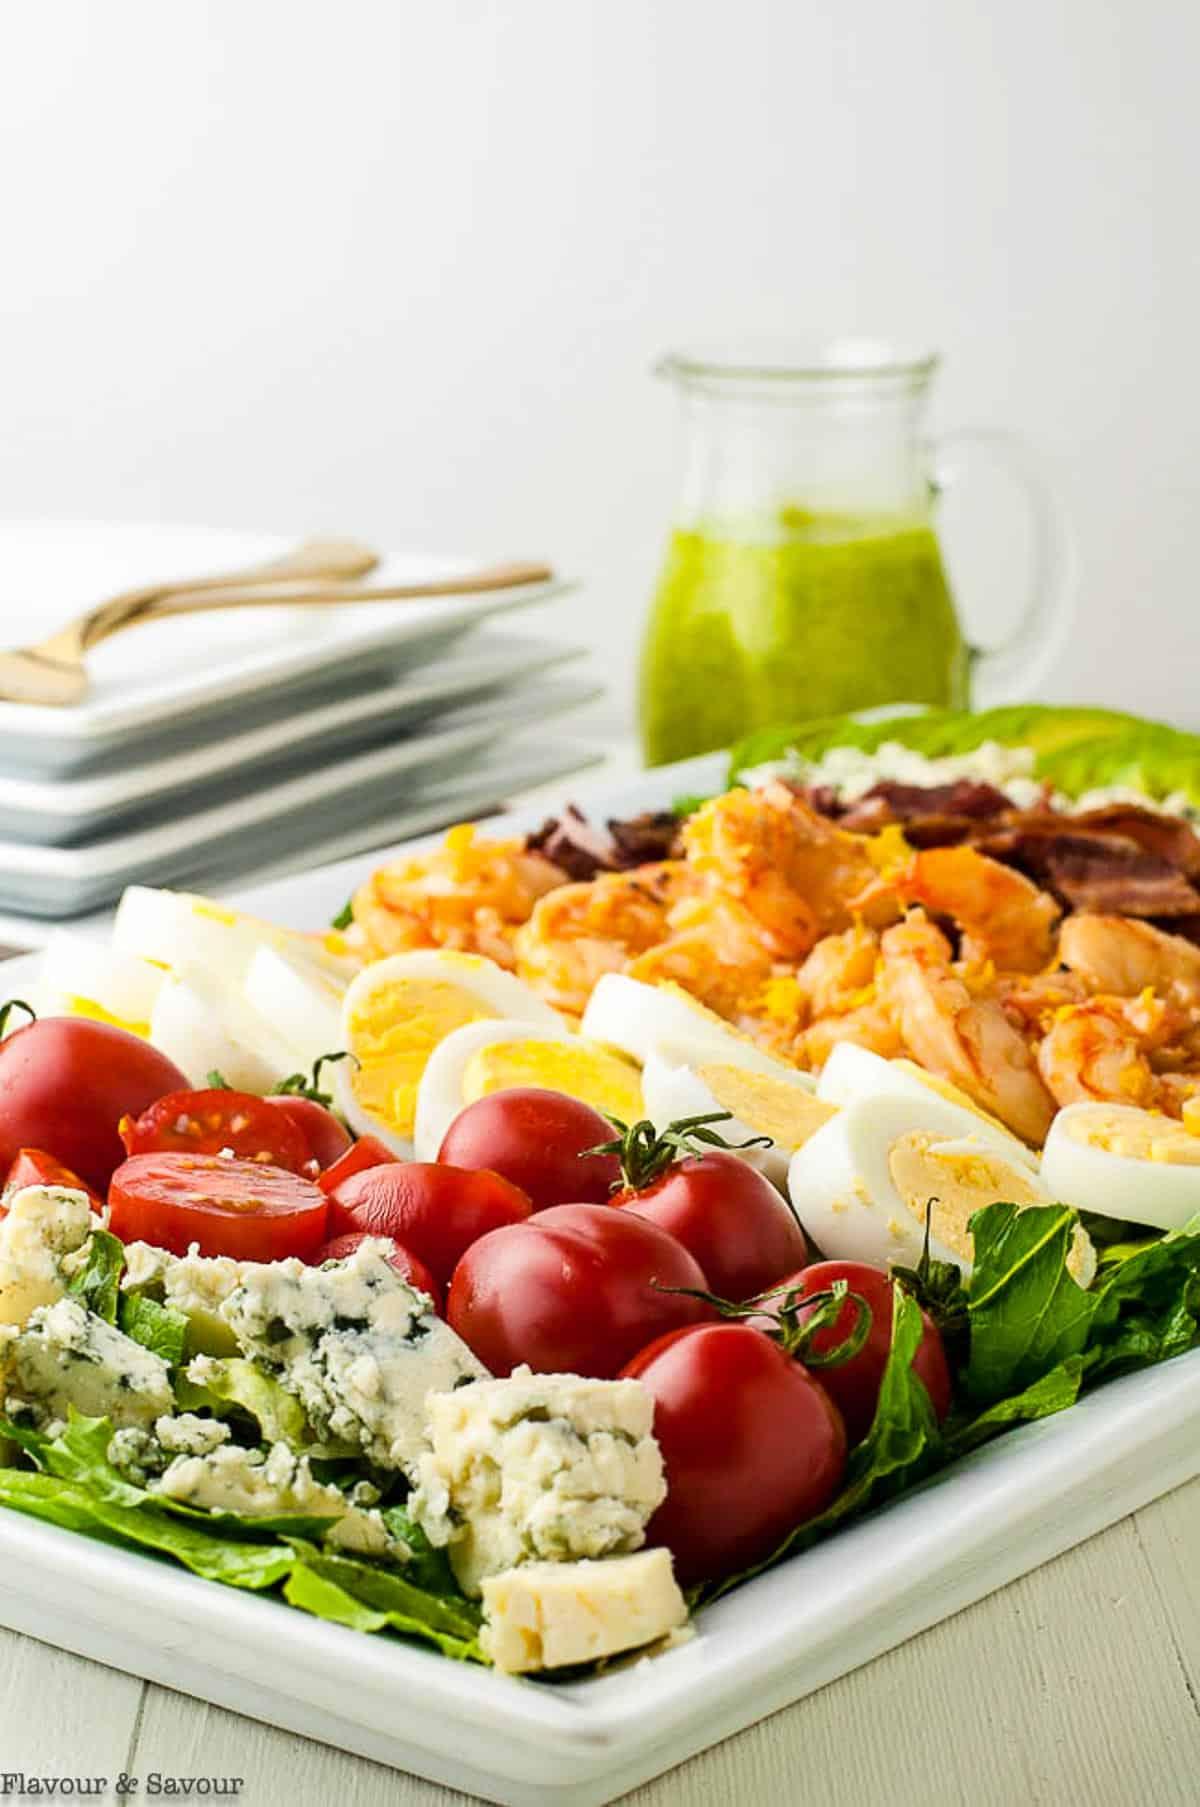 Lemon Garlic Shrimp Cobb Salad on a platter with a pitcher of dressing